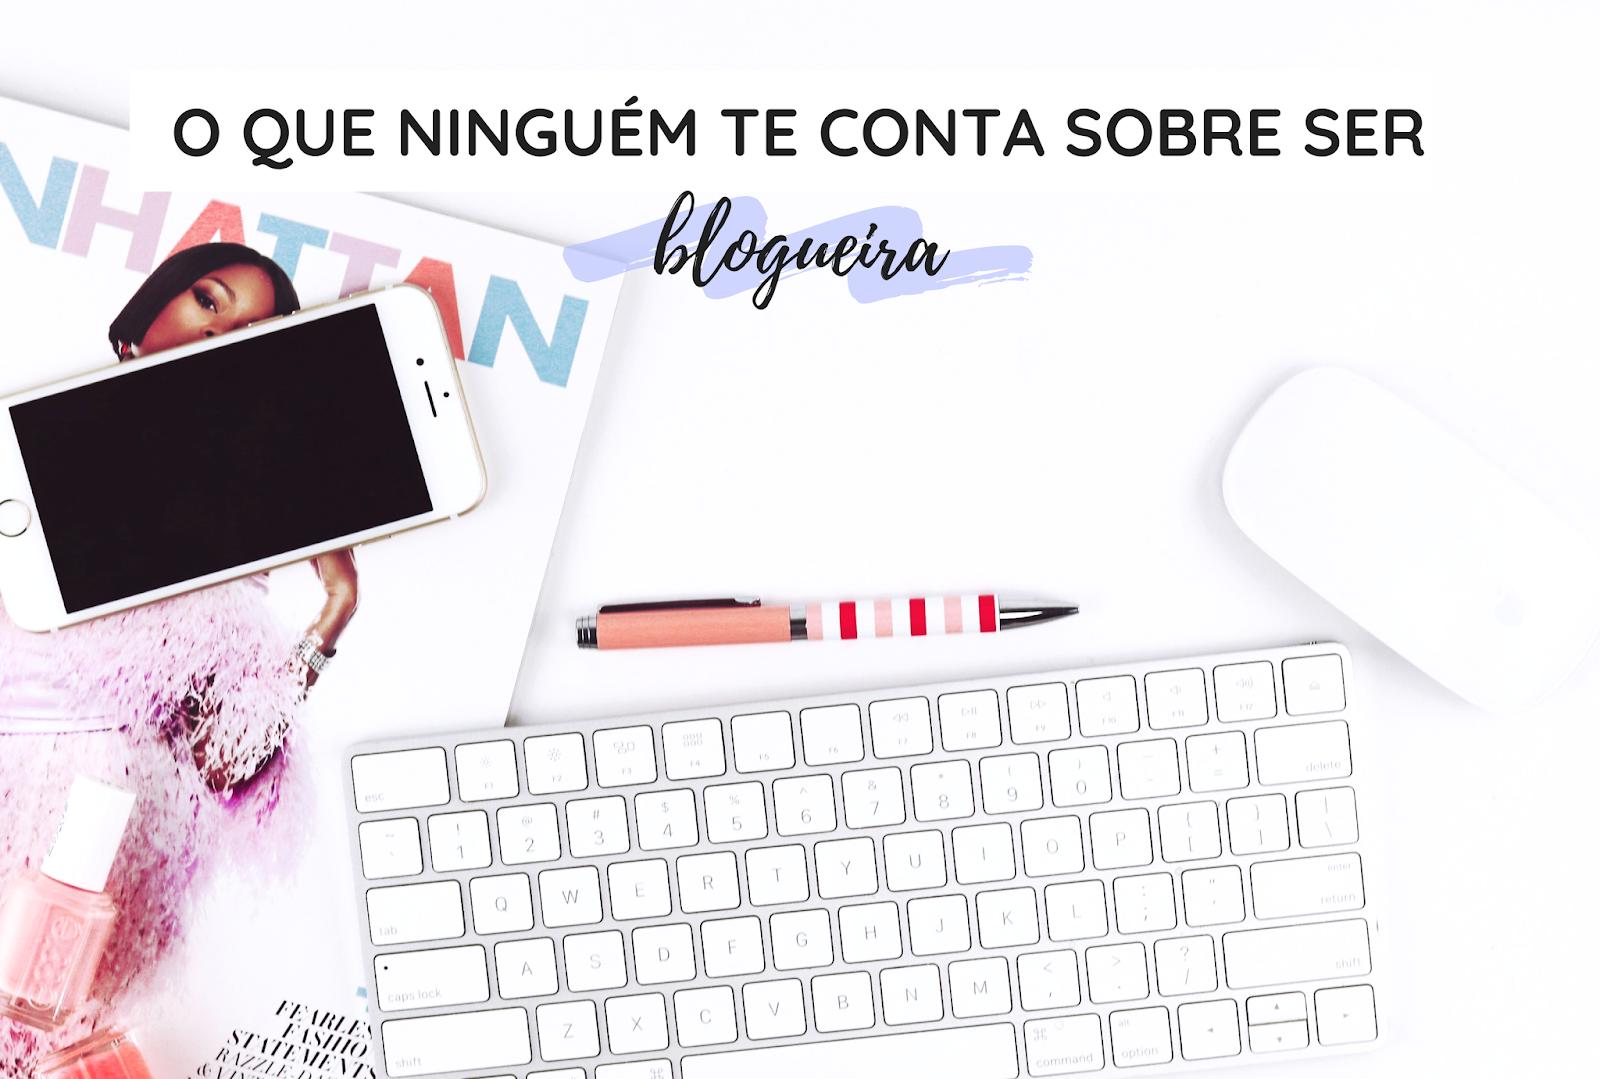 SHHHH | 8 coisas que ninguém te conta sobre ser blogueira